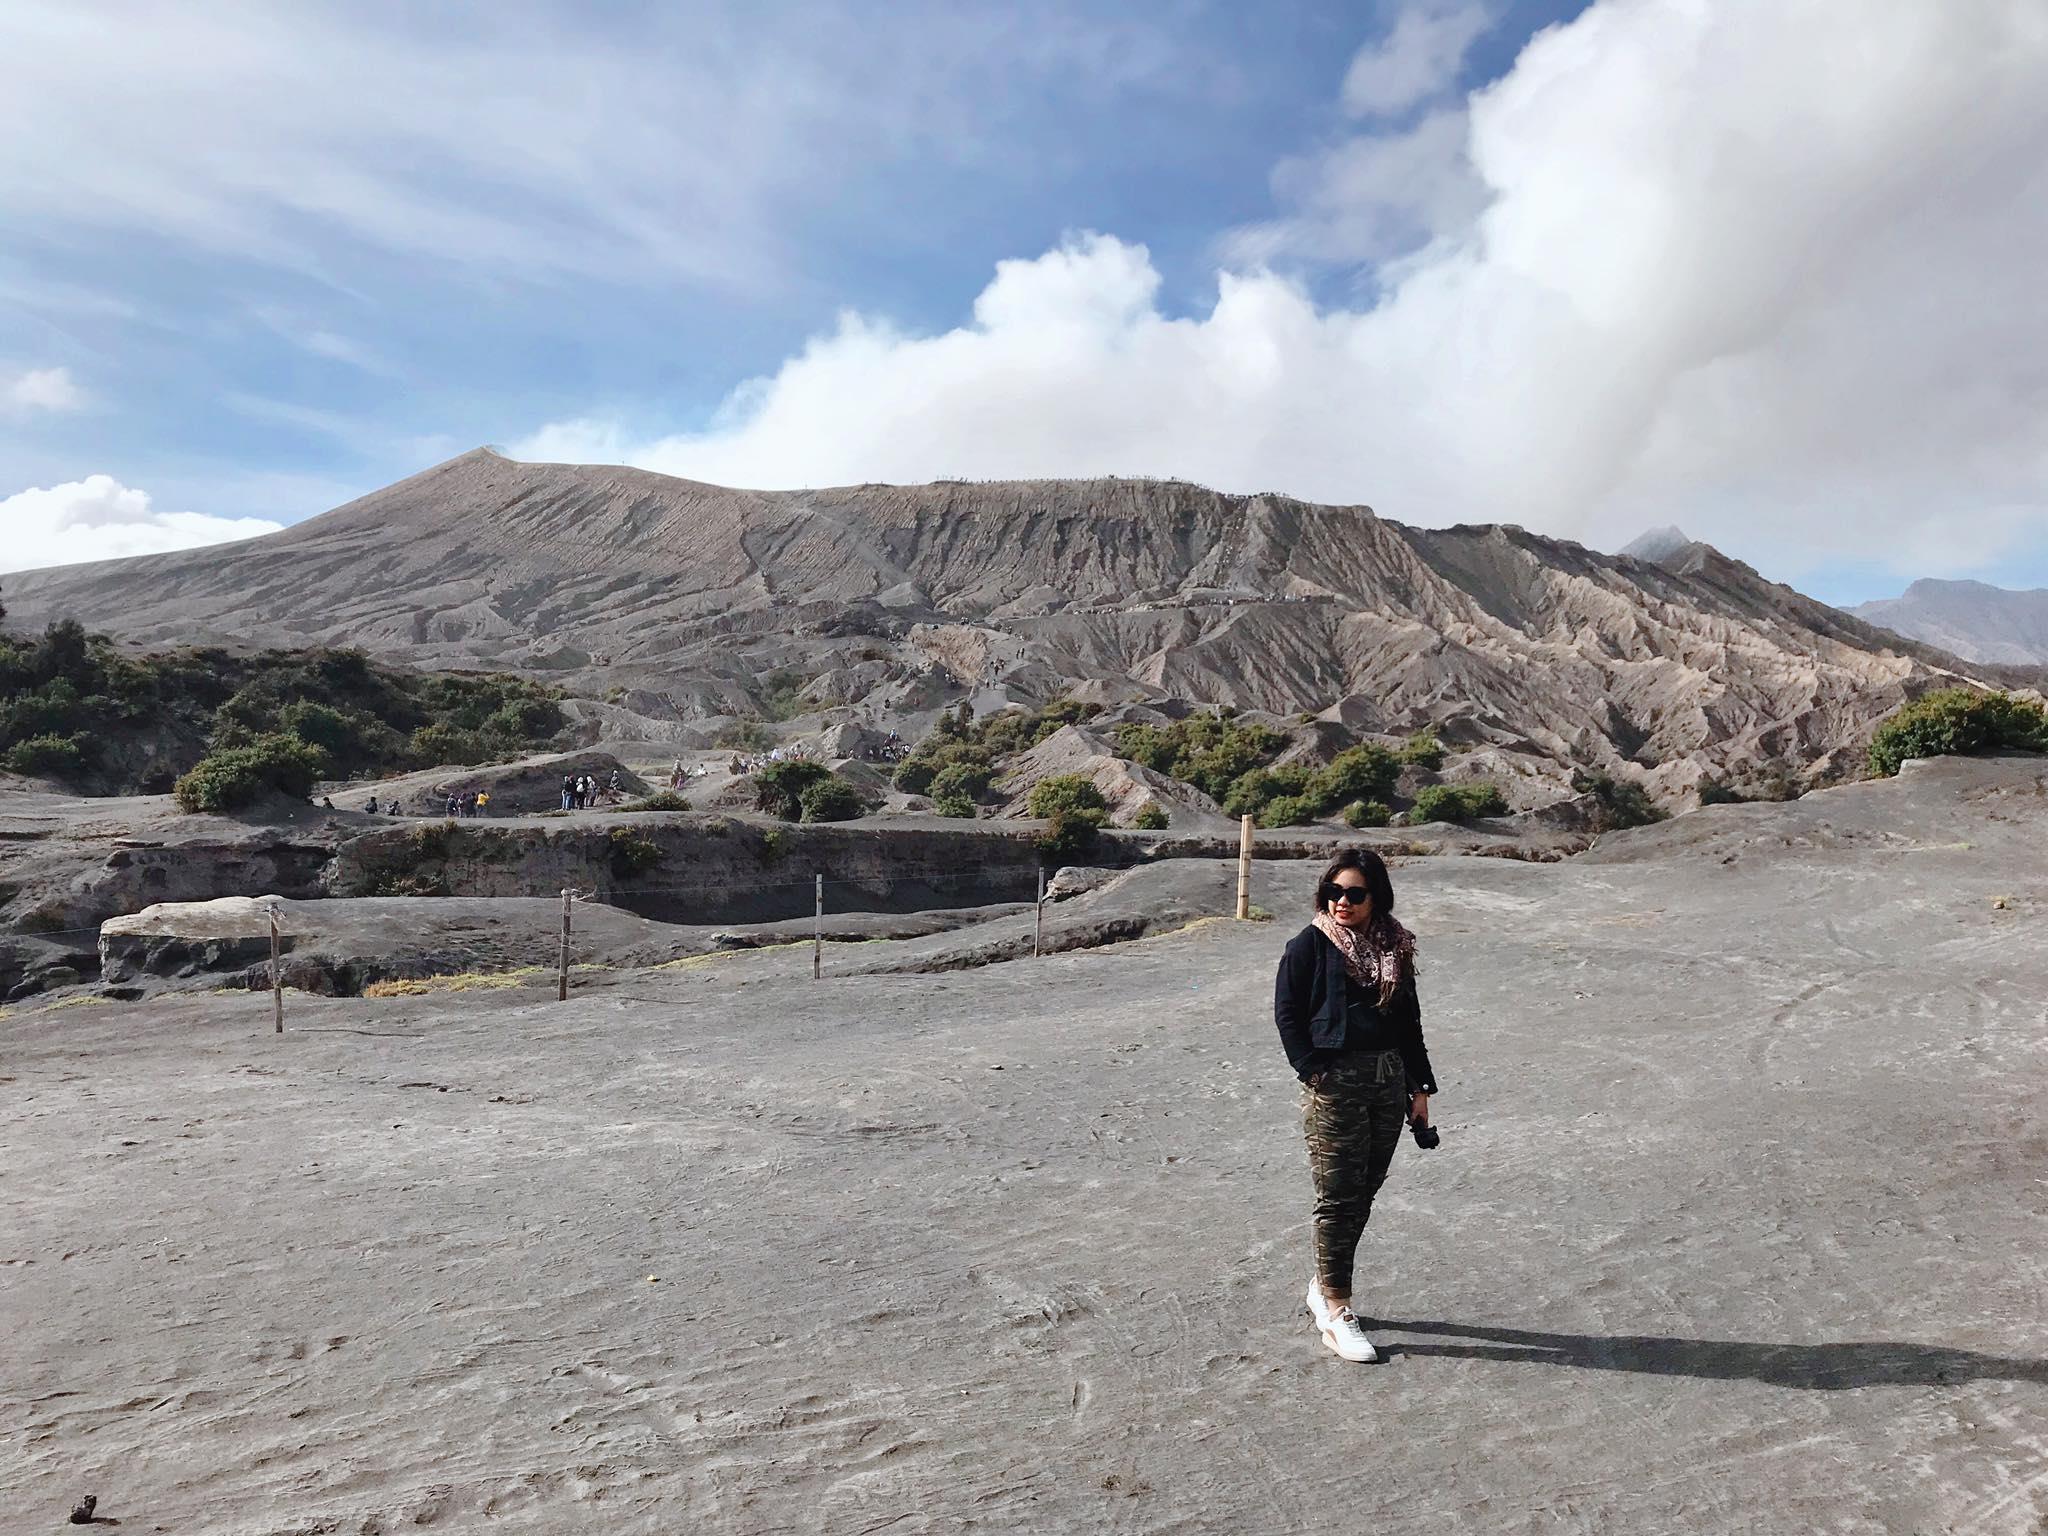 Núi lửa Bromo ở Indonesia